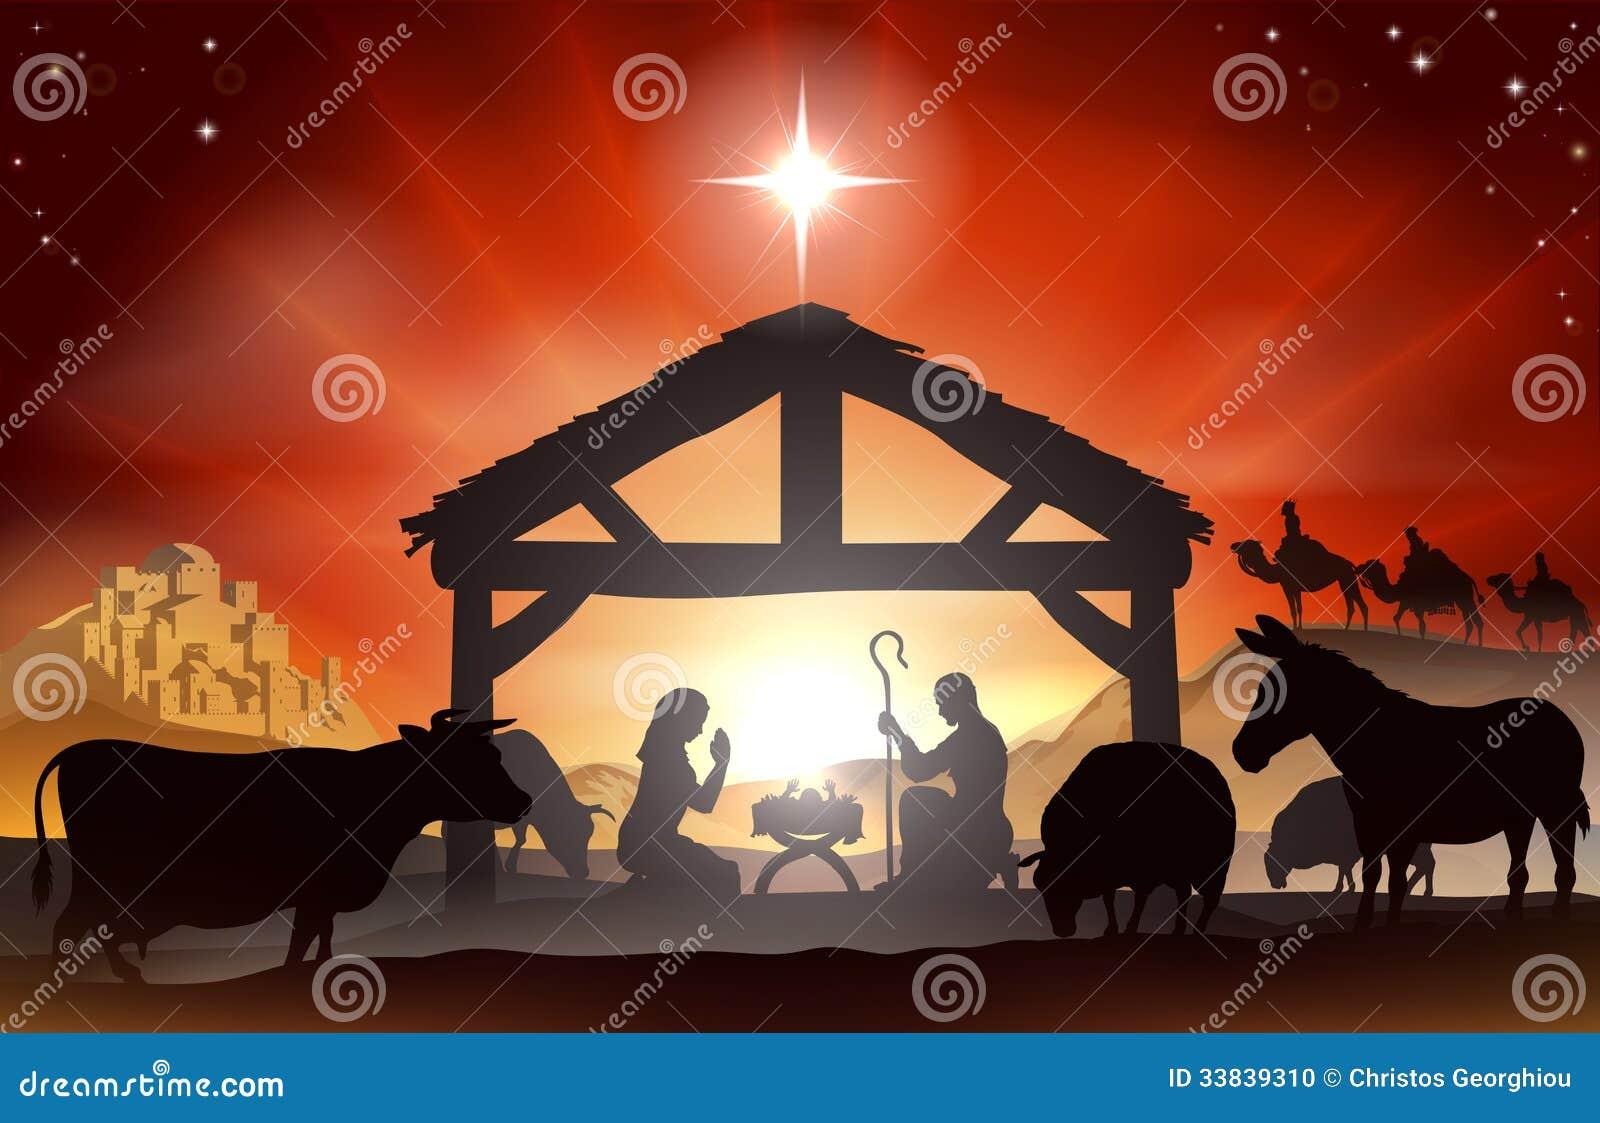 Clipart Jesus On Donkey